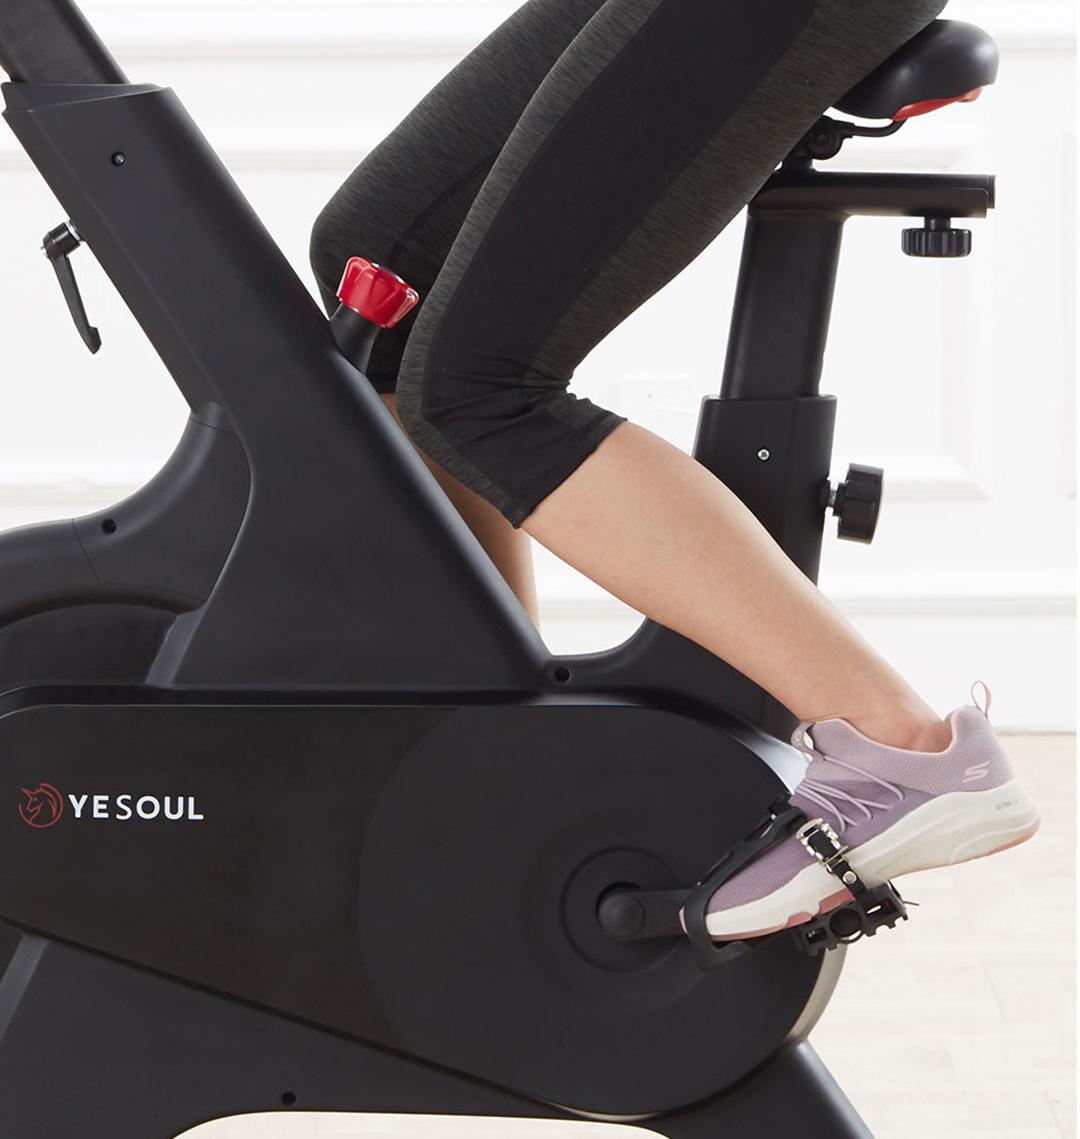 Yesoul Smart Exercise Bike M1